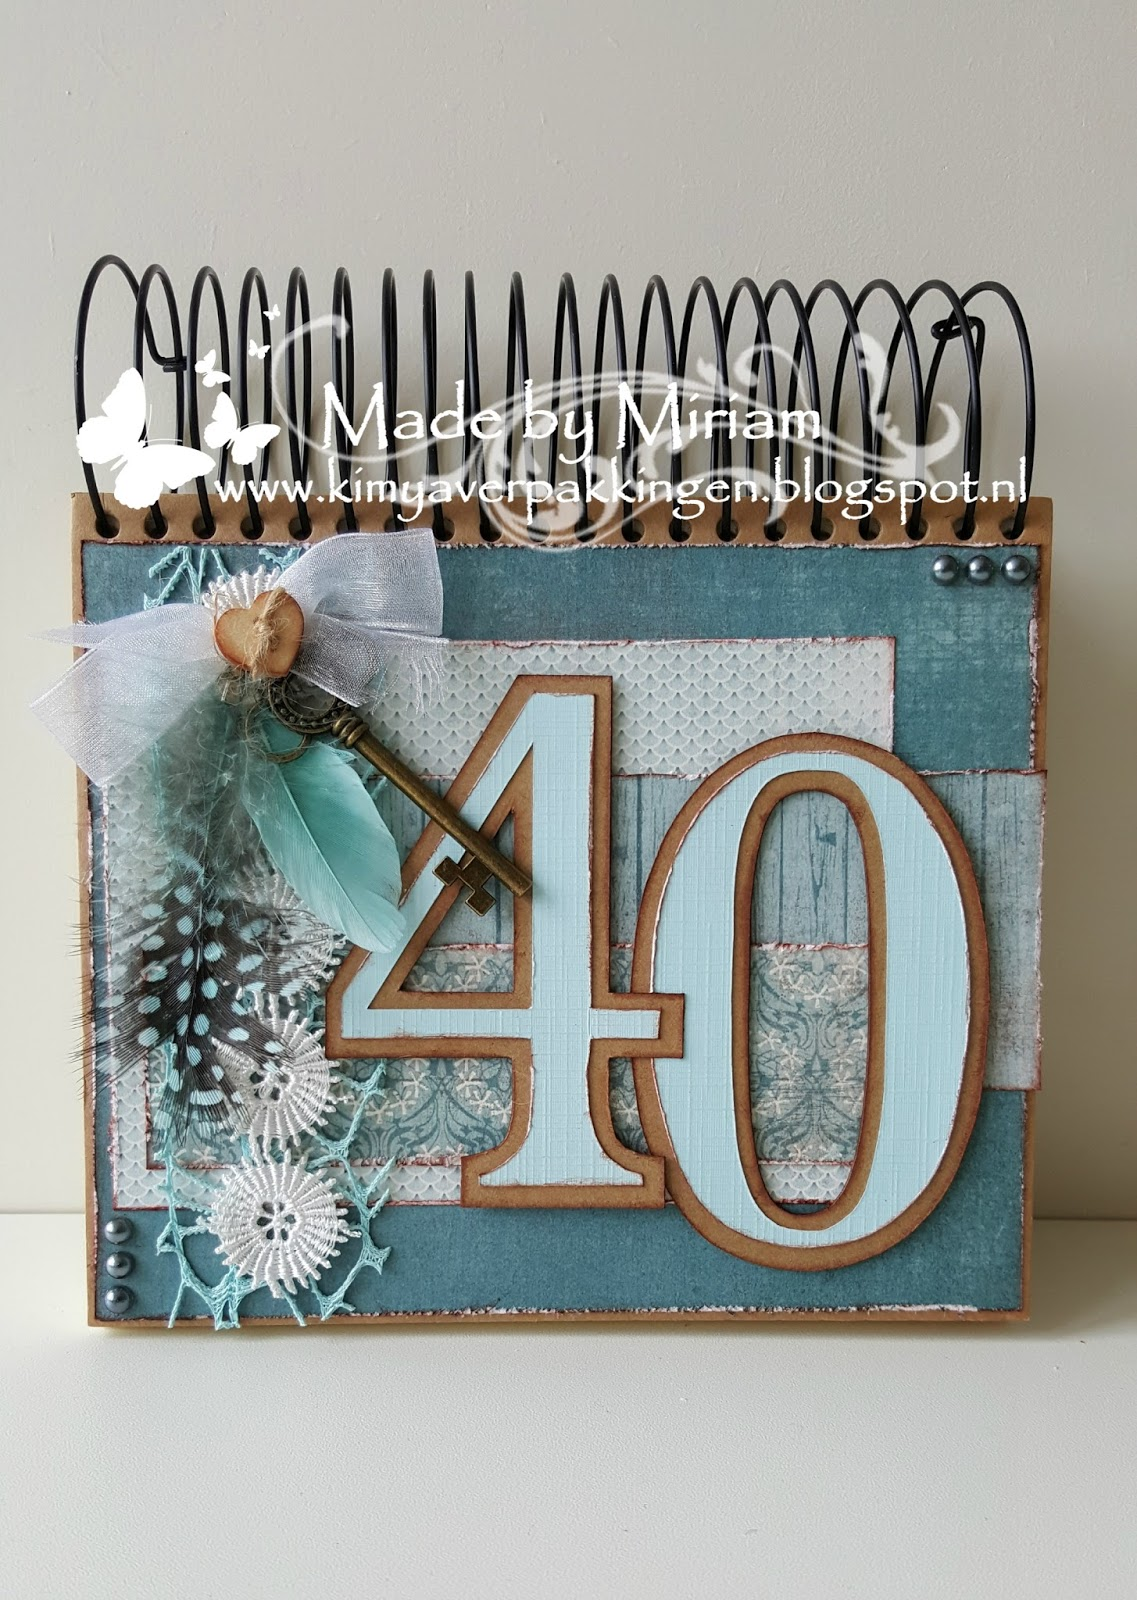 33 jaar getrouwd cadeau Kado 33 Jaar Getrouwd   ARCHIDEV 33 jaar getrouwd cadeau